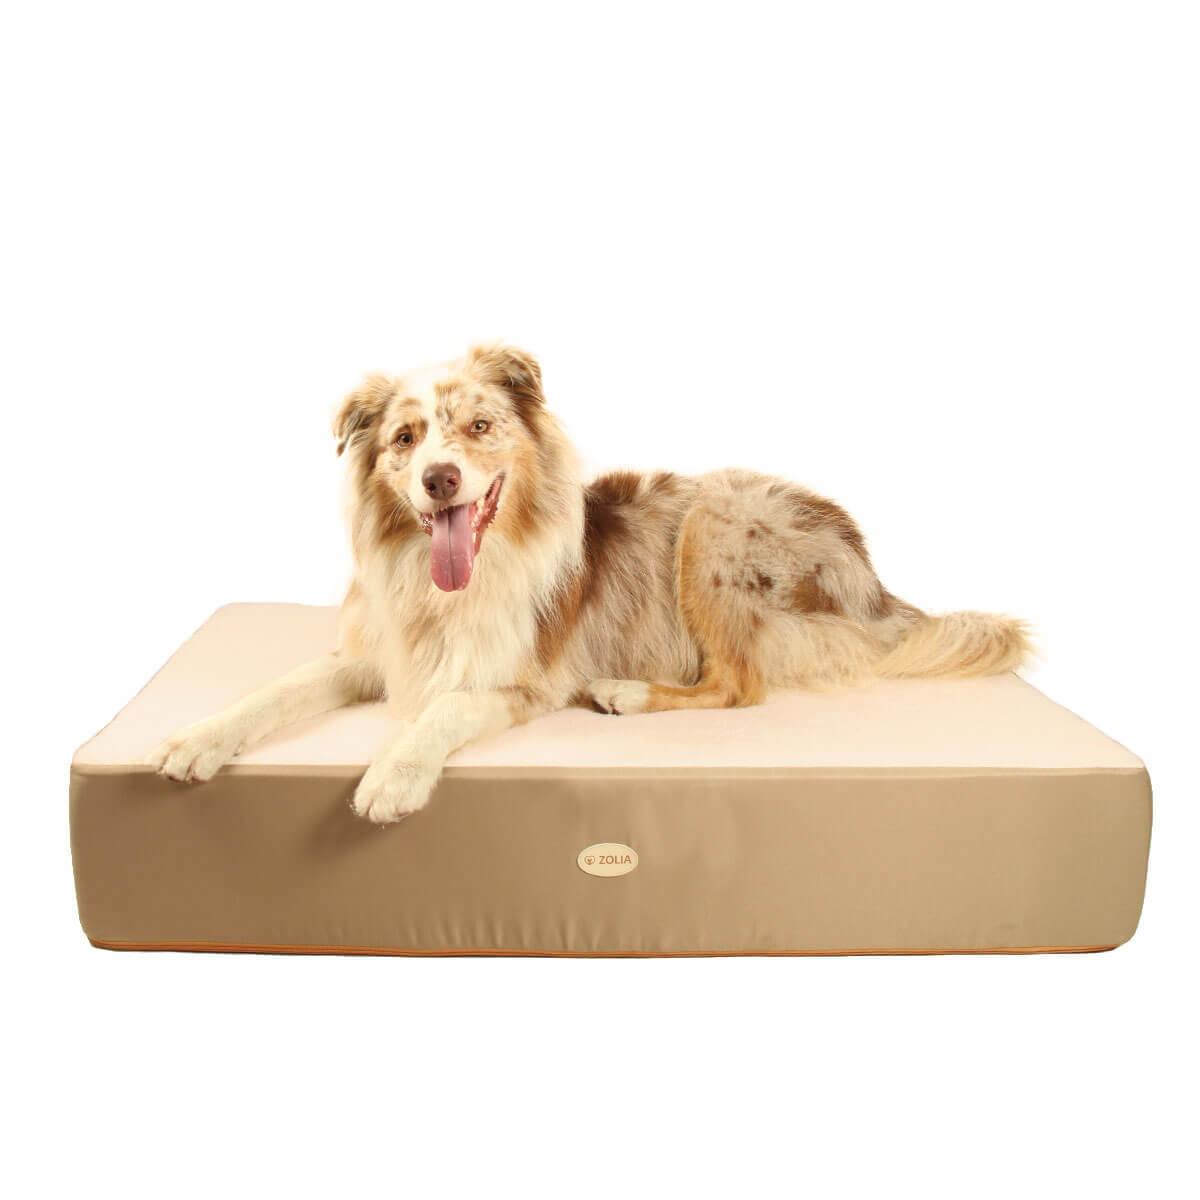 Cochón ZOLIA NAYA 110 cm Maxi espesor para perros_0